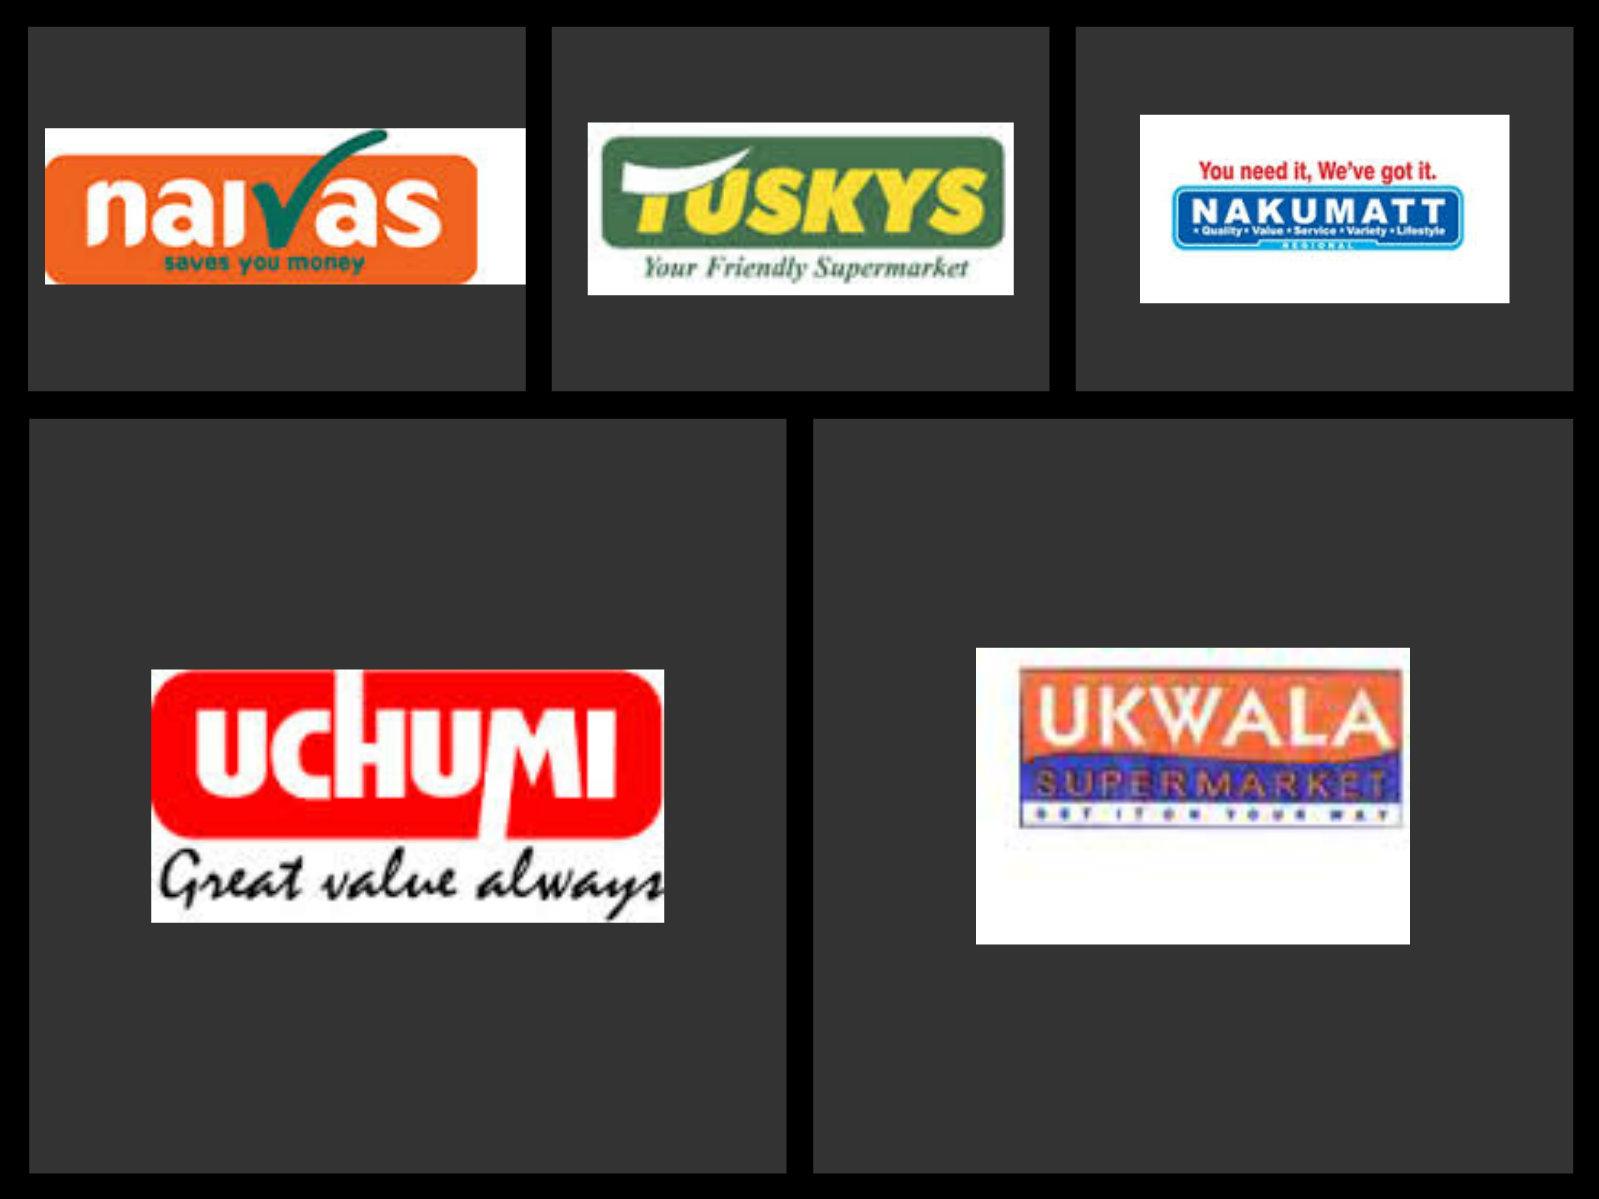 The logos of major supermarkets in Kenya